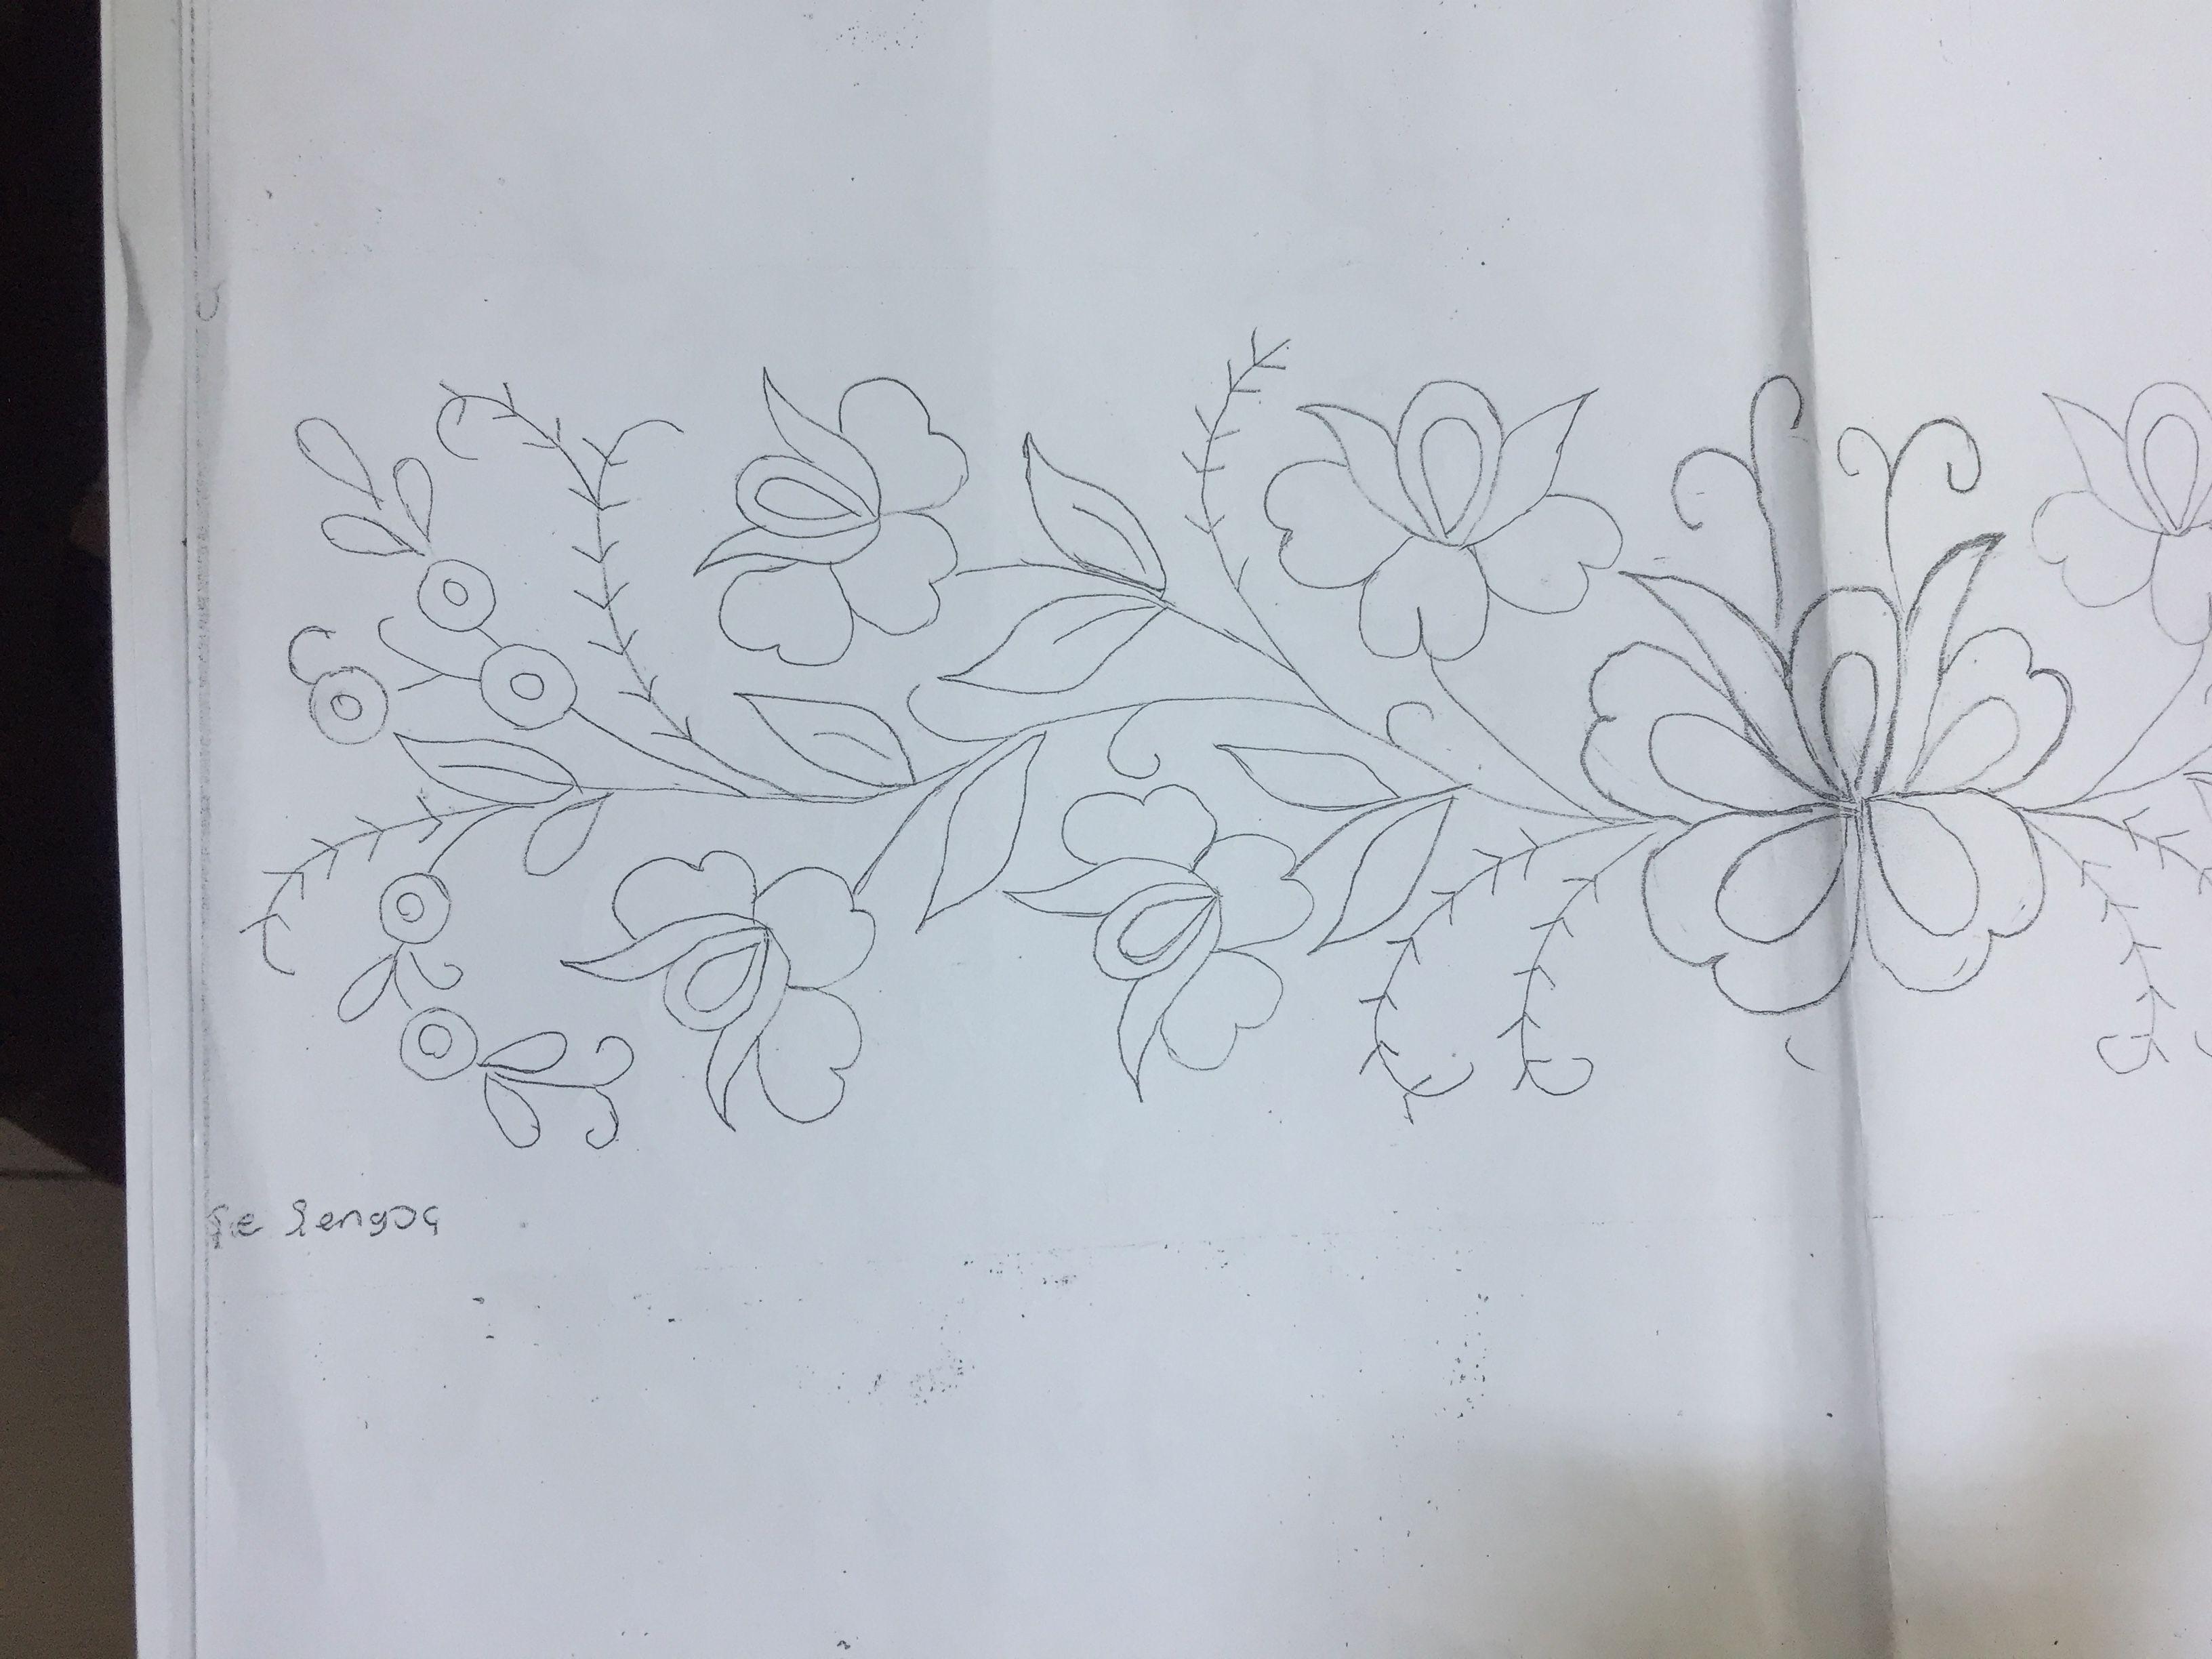 Pin de Ayşe Metin en nakış desenleri   Pinterest   Dibujos para ...